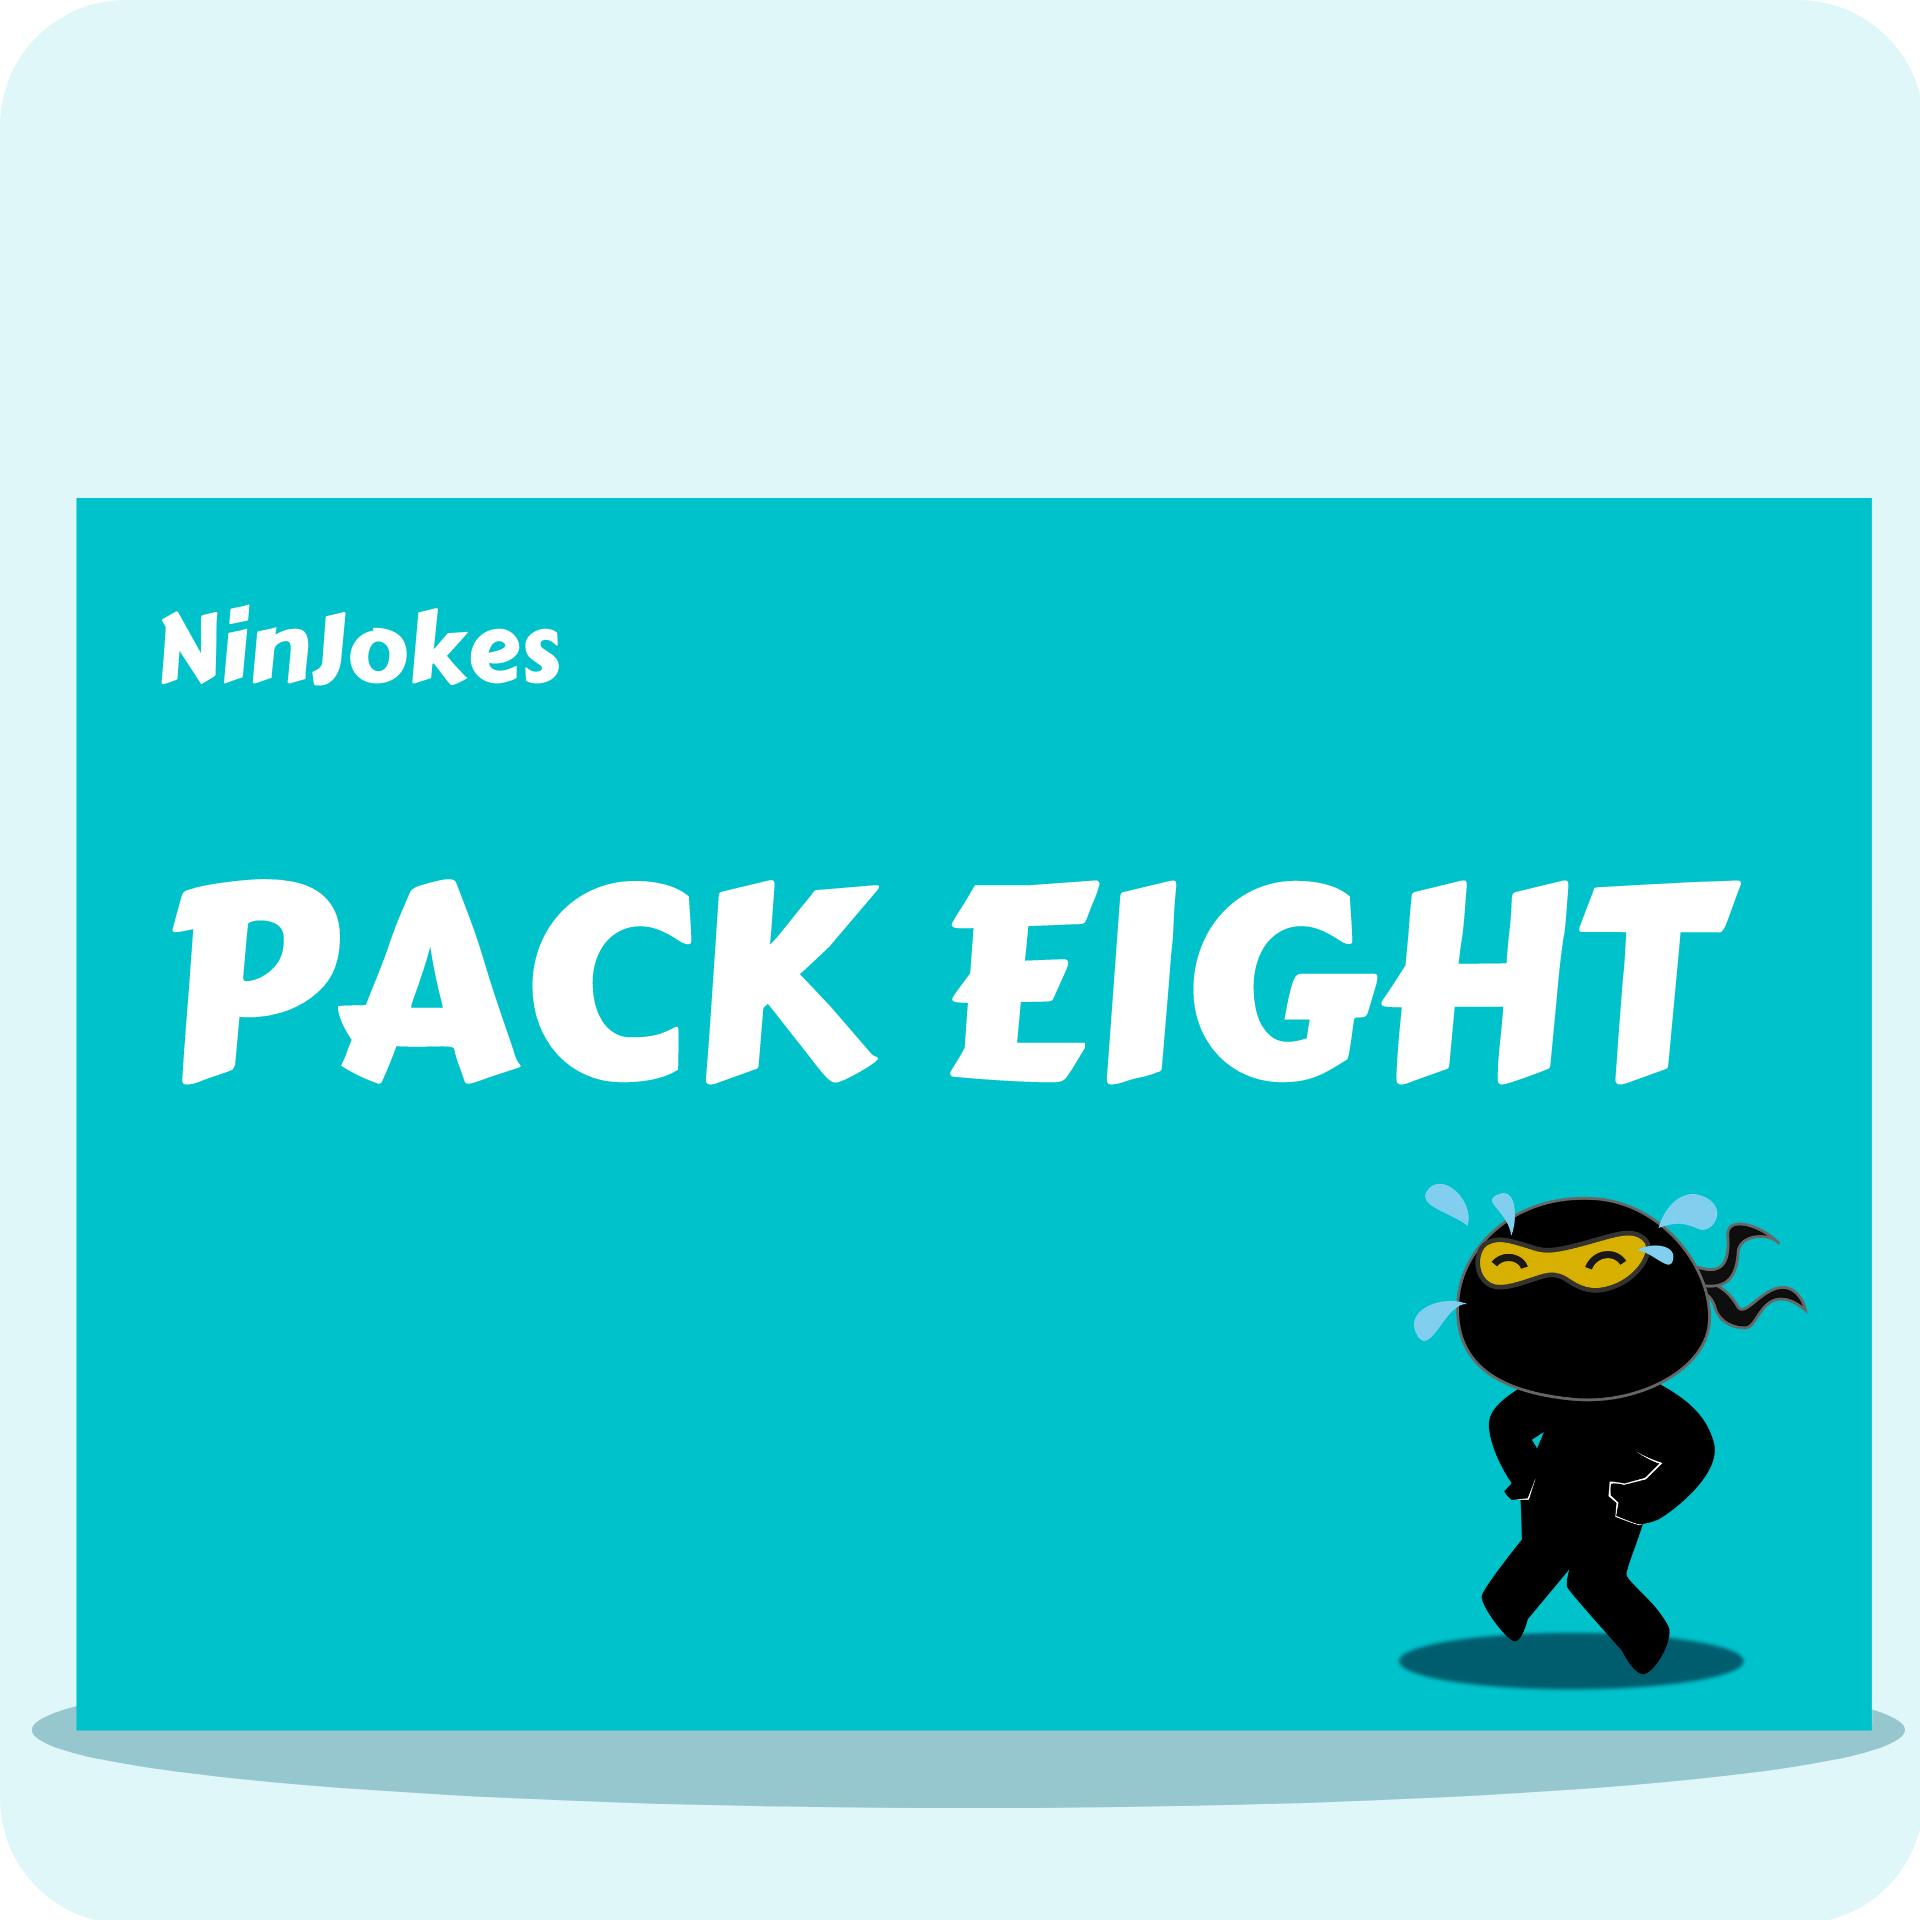 NinJokes Pack Eight